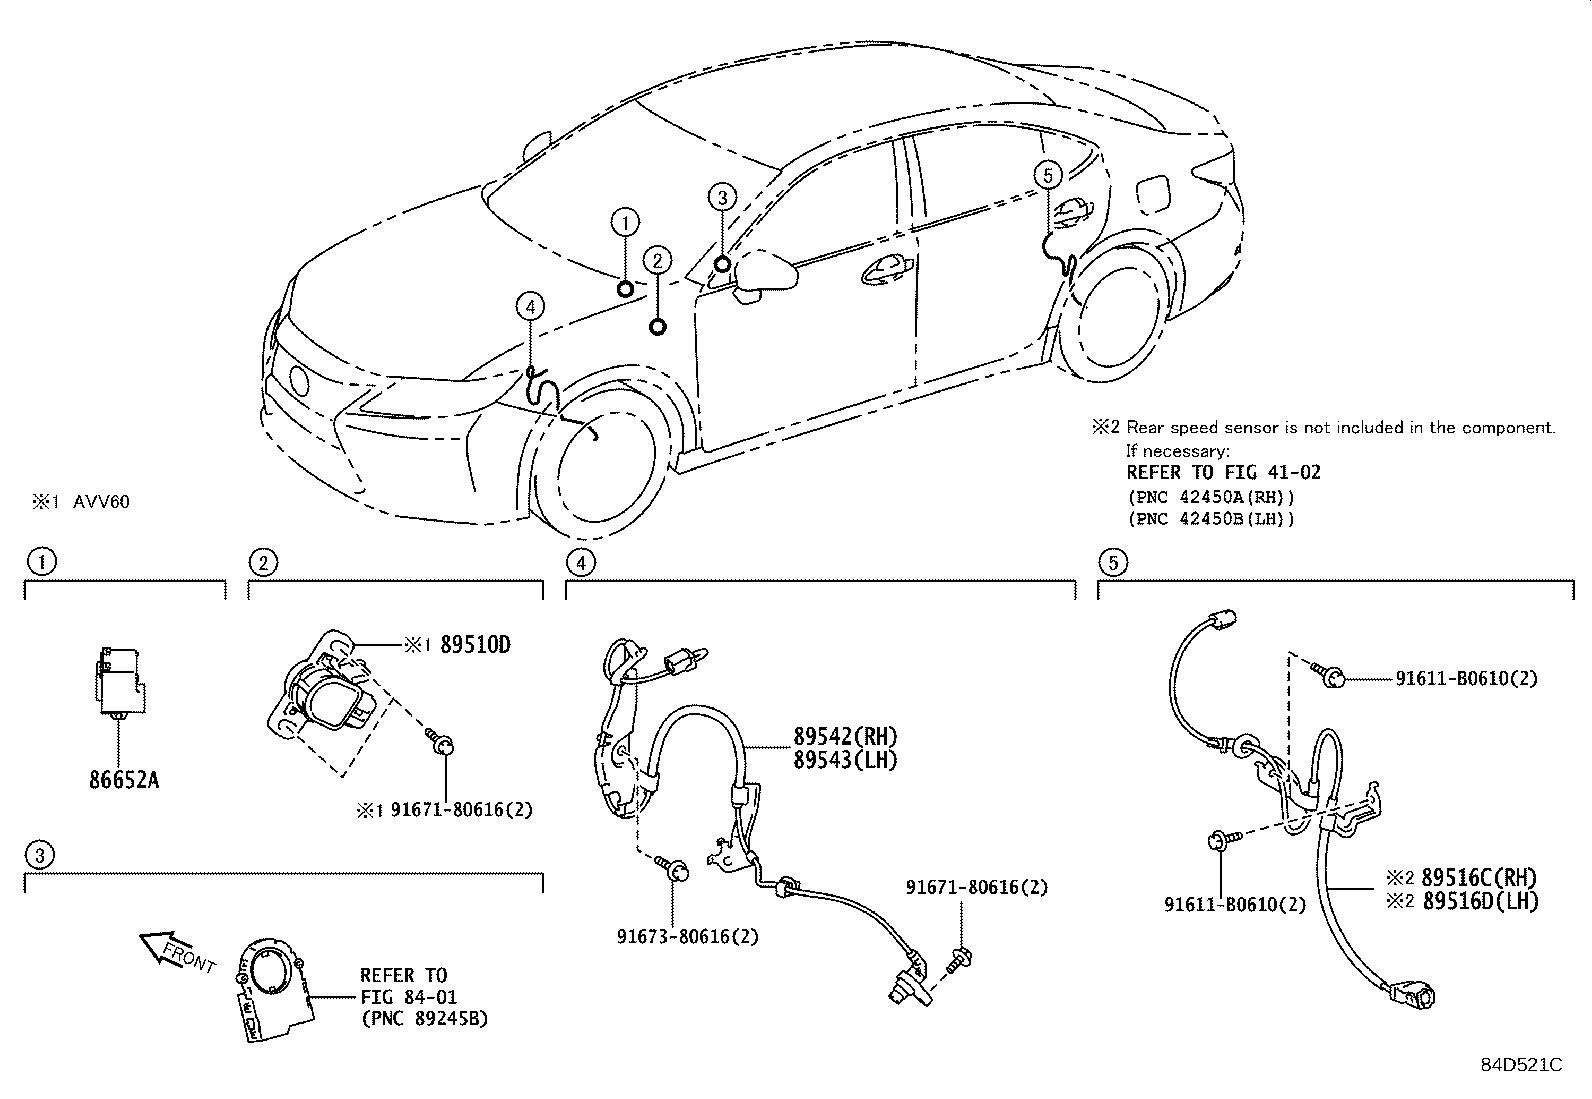 Lexus ES 350 Wire, skid control sensor, right. Vsc